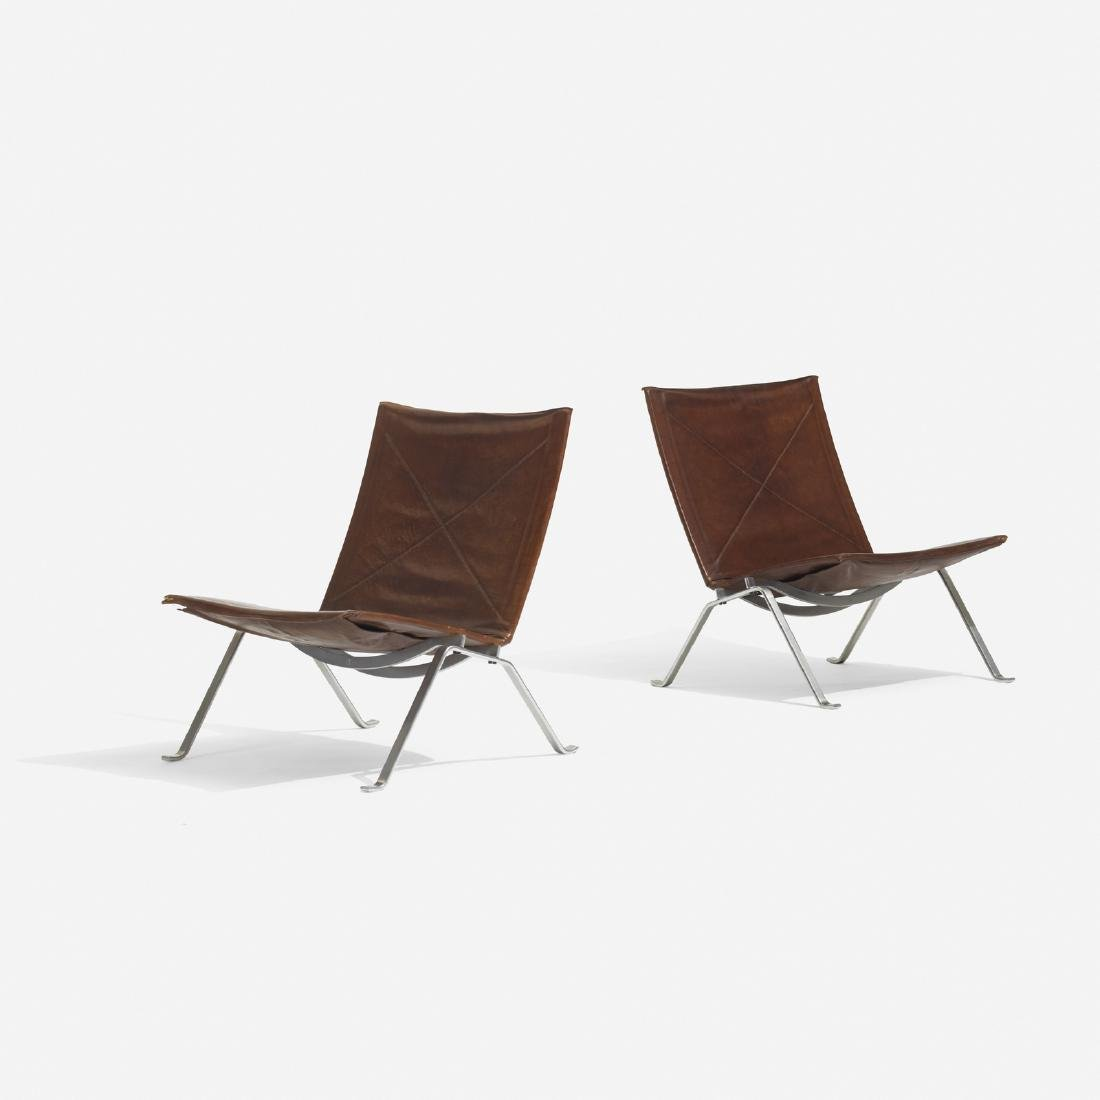 Poul Kjaerholm, PK 22 lounge chairs, pair - 2